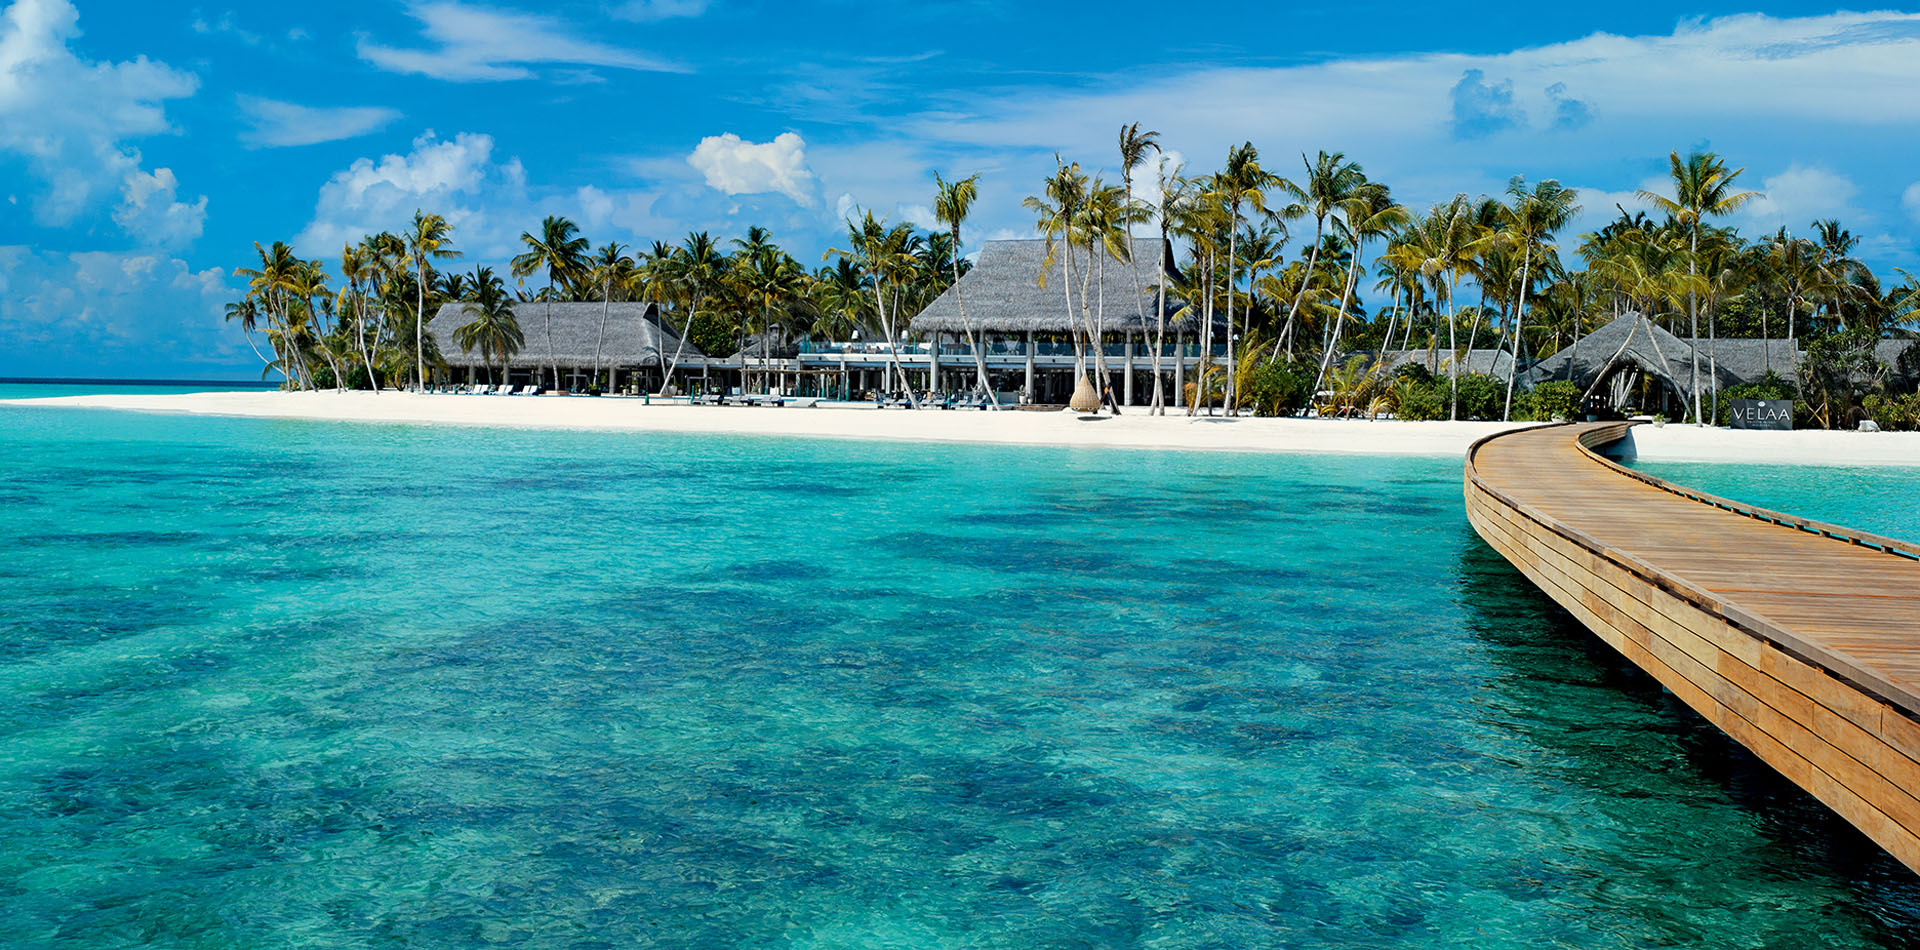 Veela Private Island Maldives, Luxushotel Malediven, Luxusreise Malediven